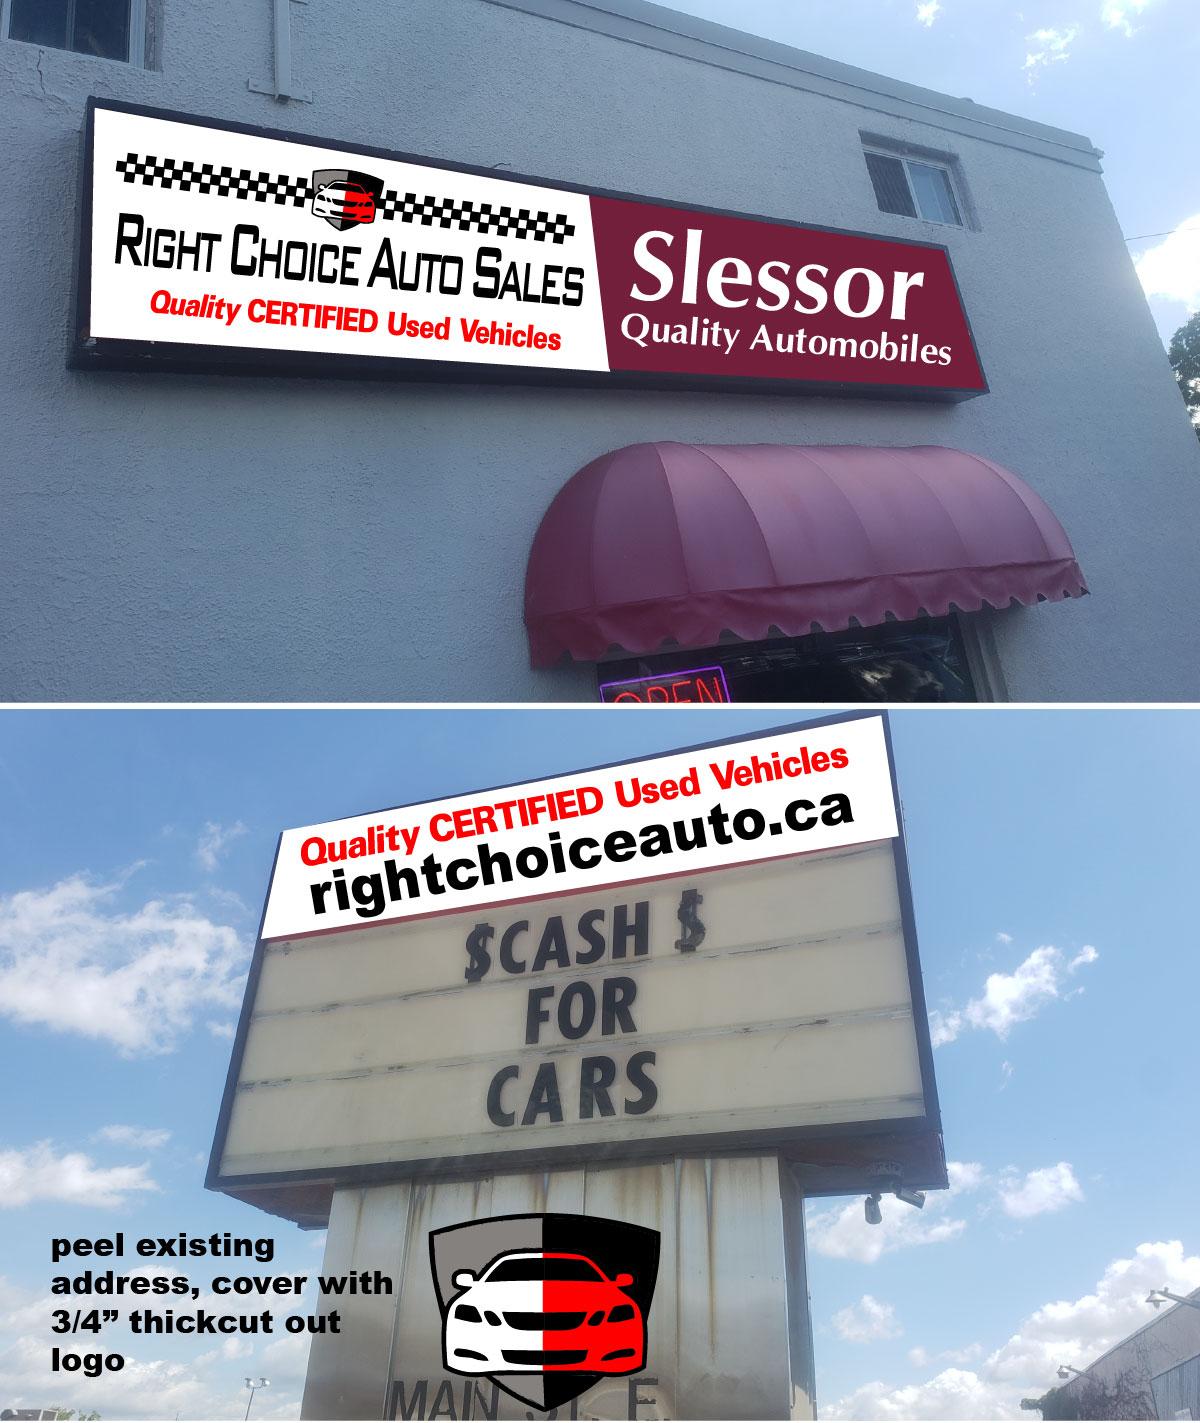 Right Choice Auto Sales